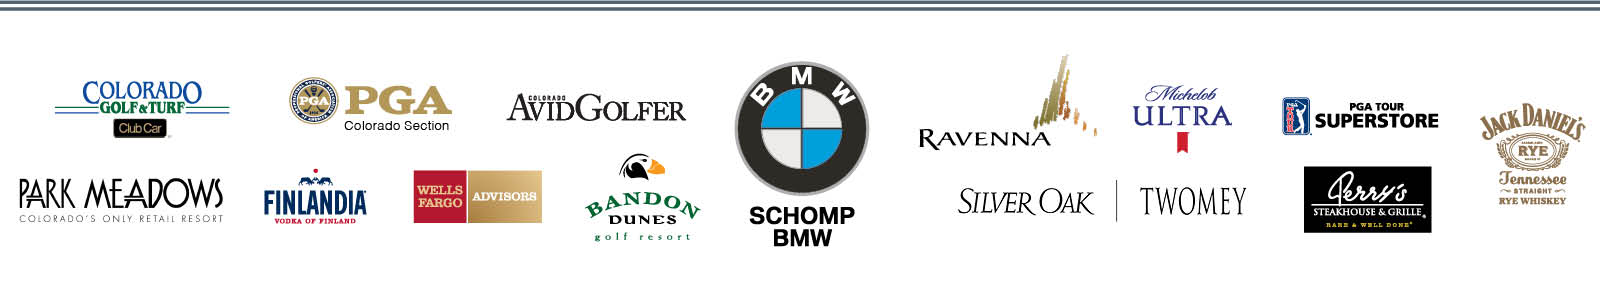 2019 Schomp BMW Cup 3/22/2019